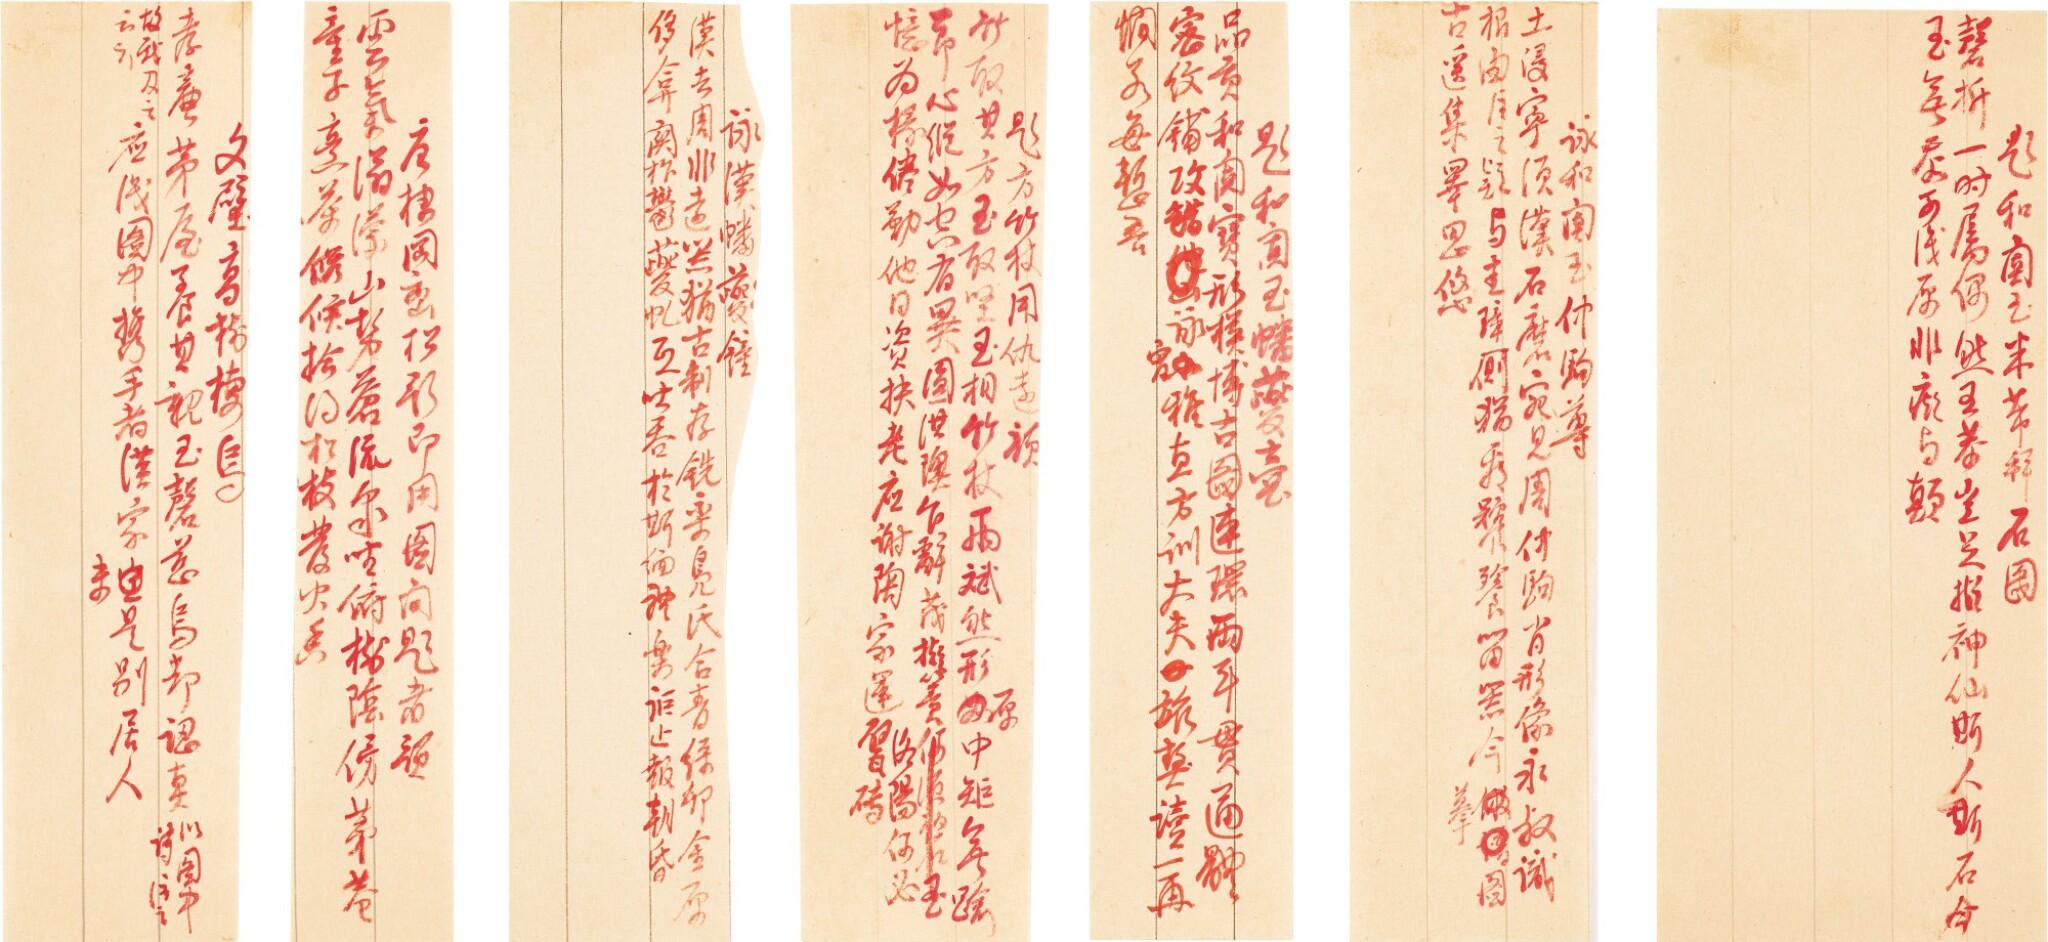 View full screen - View 1 of Lot 3119. Hongli (Emperor Qianlong) 1711-1799 弘曆(乾隆帝) 1711-1799   Manuscript of Antique Poems  御題文物詩稿七篇.